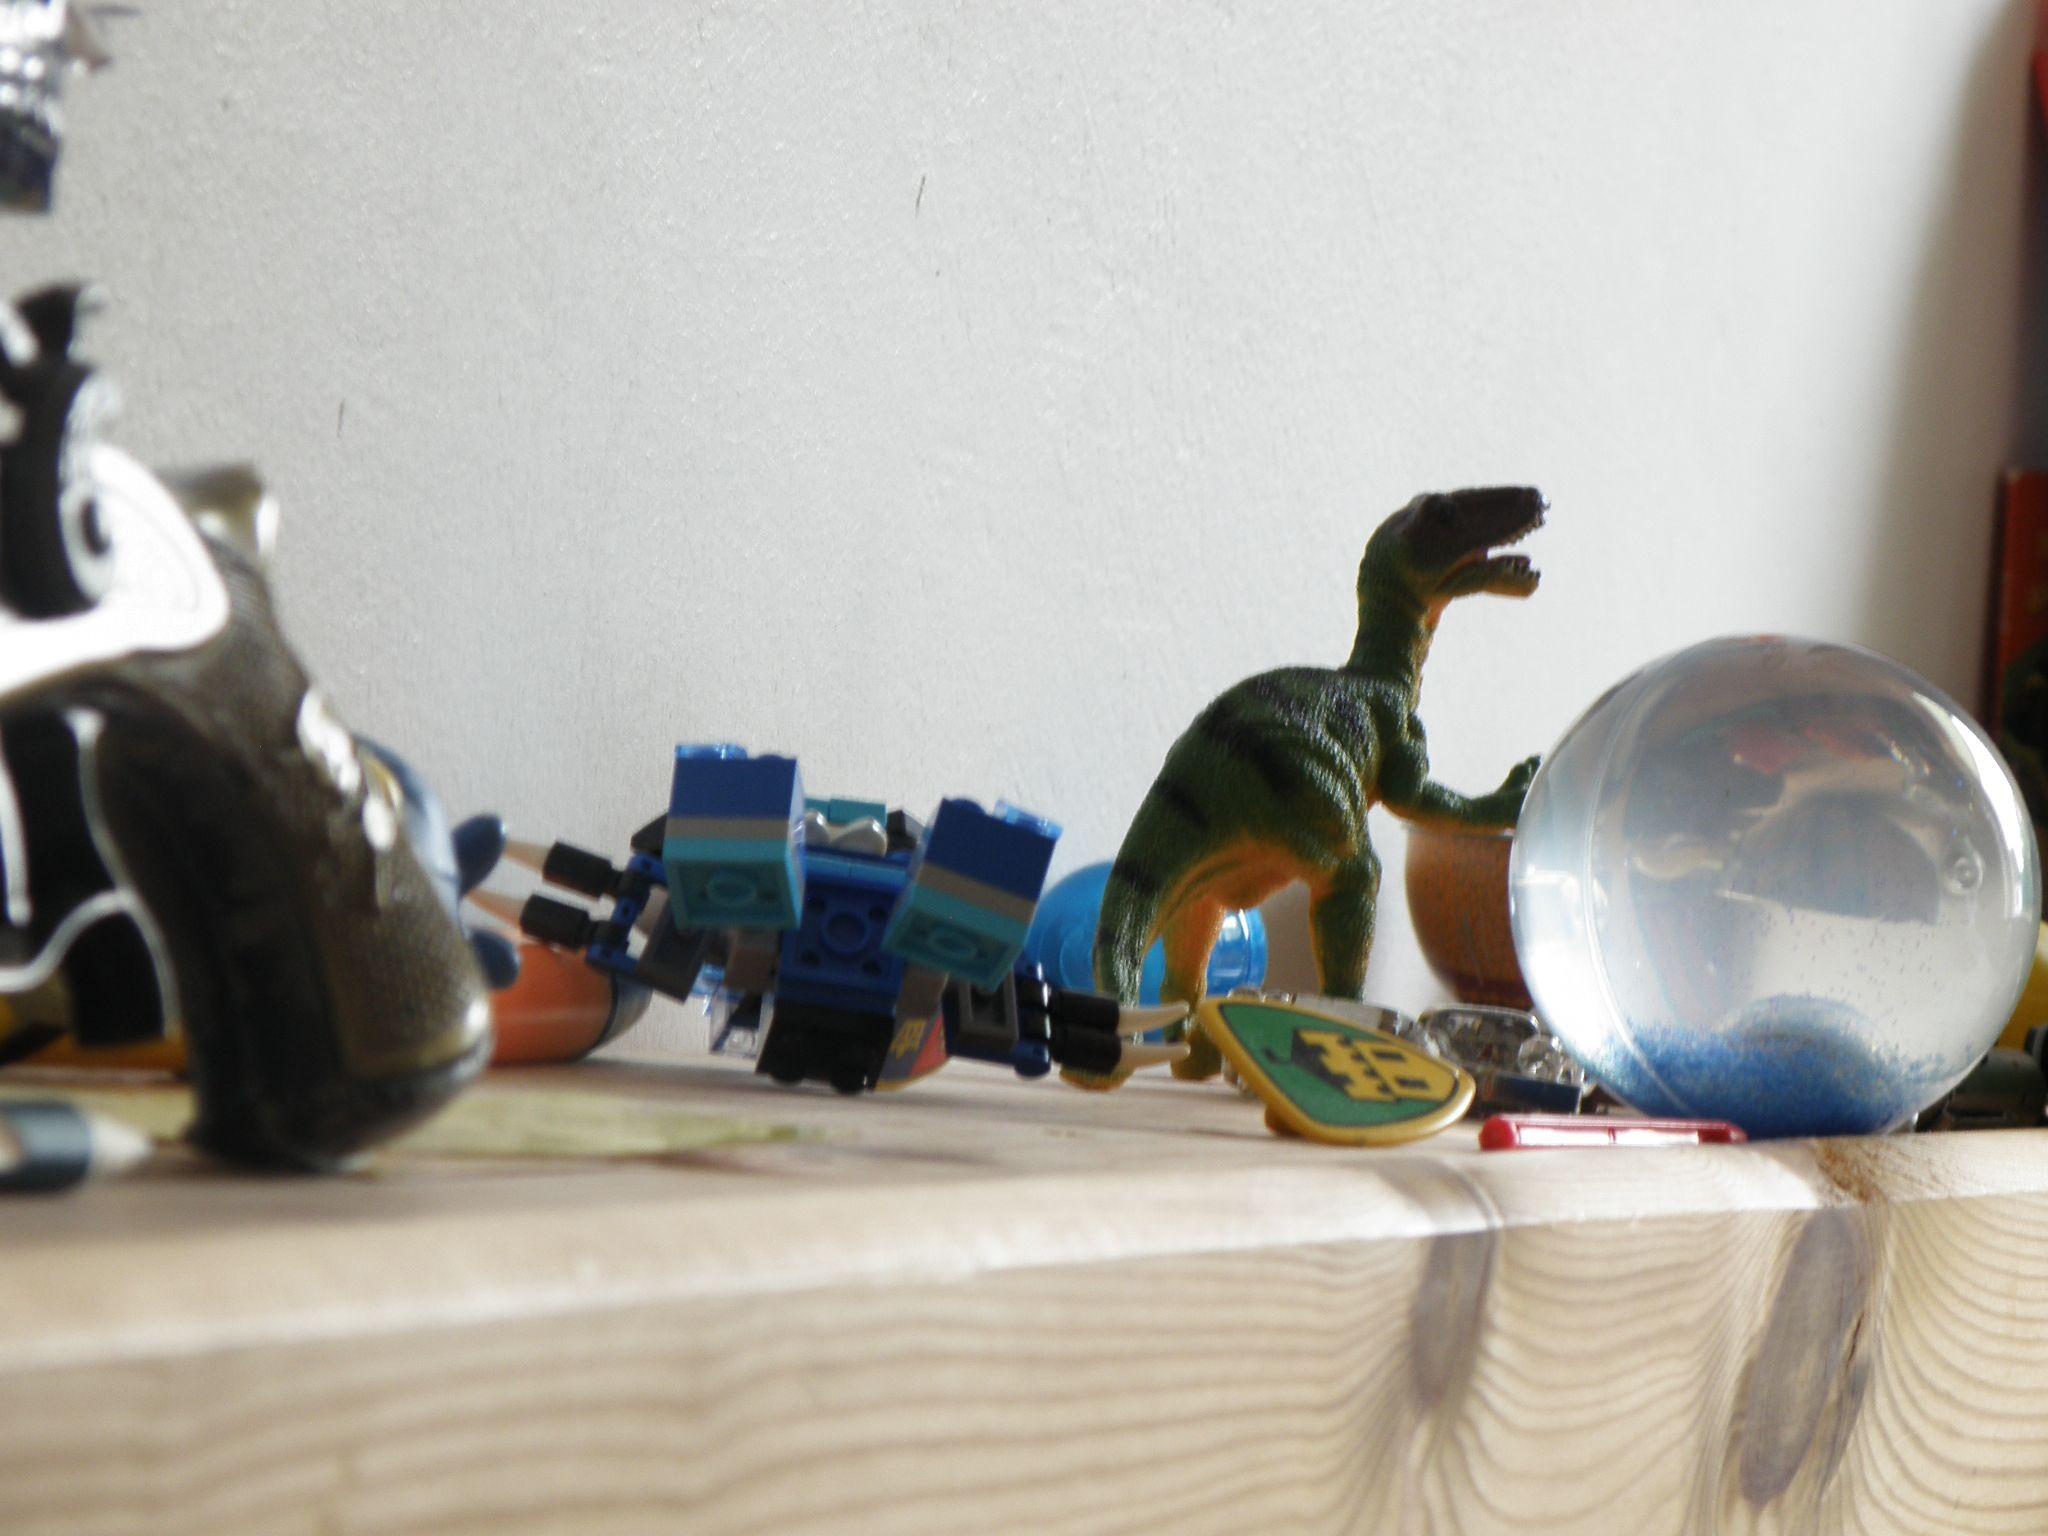 bespielbares Kinderzimmer MamaDenkt 01